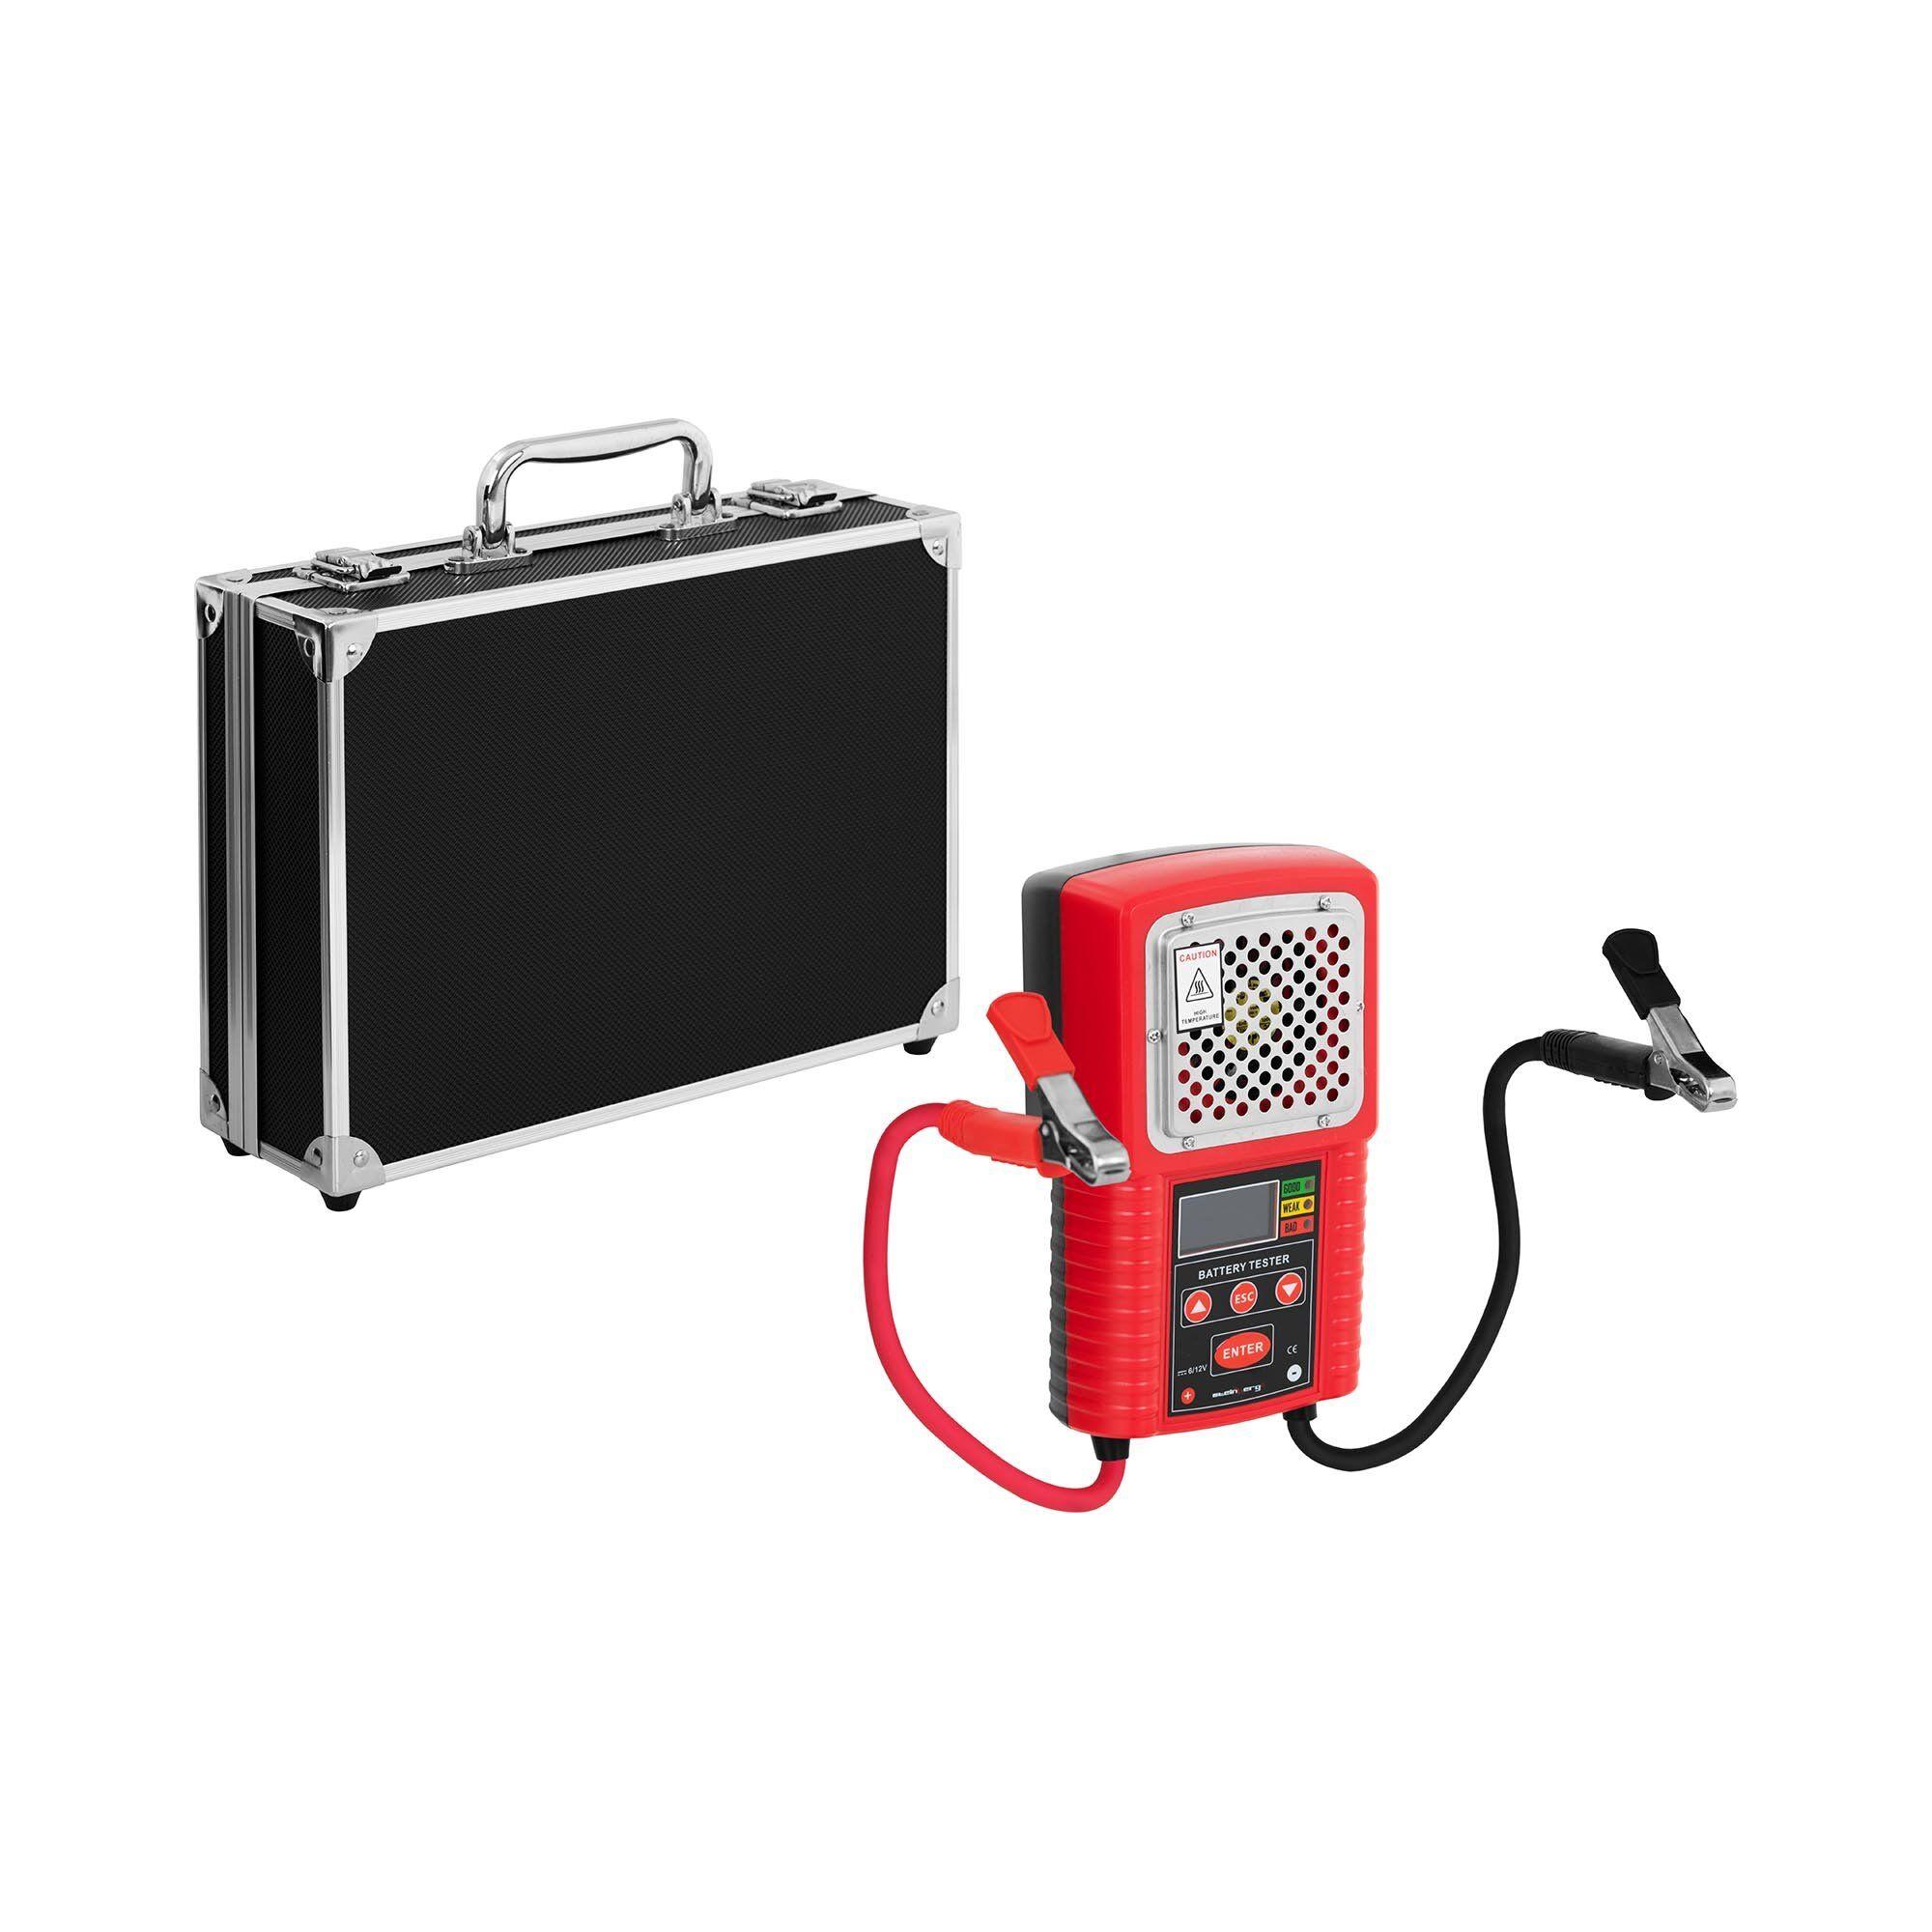 steinberg tester batteria auto professionale - 6 v/12 v sbs-bt-612